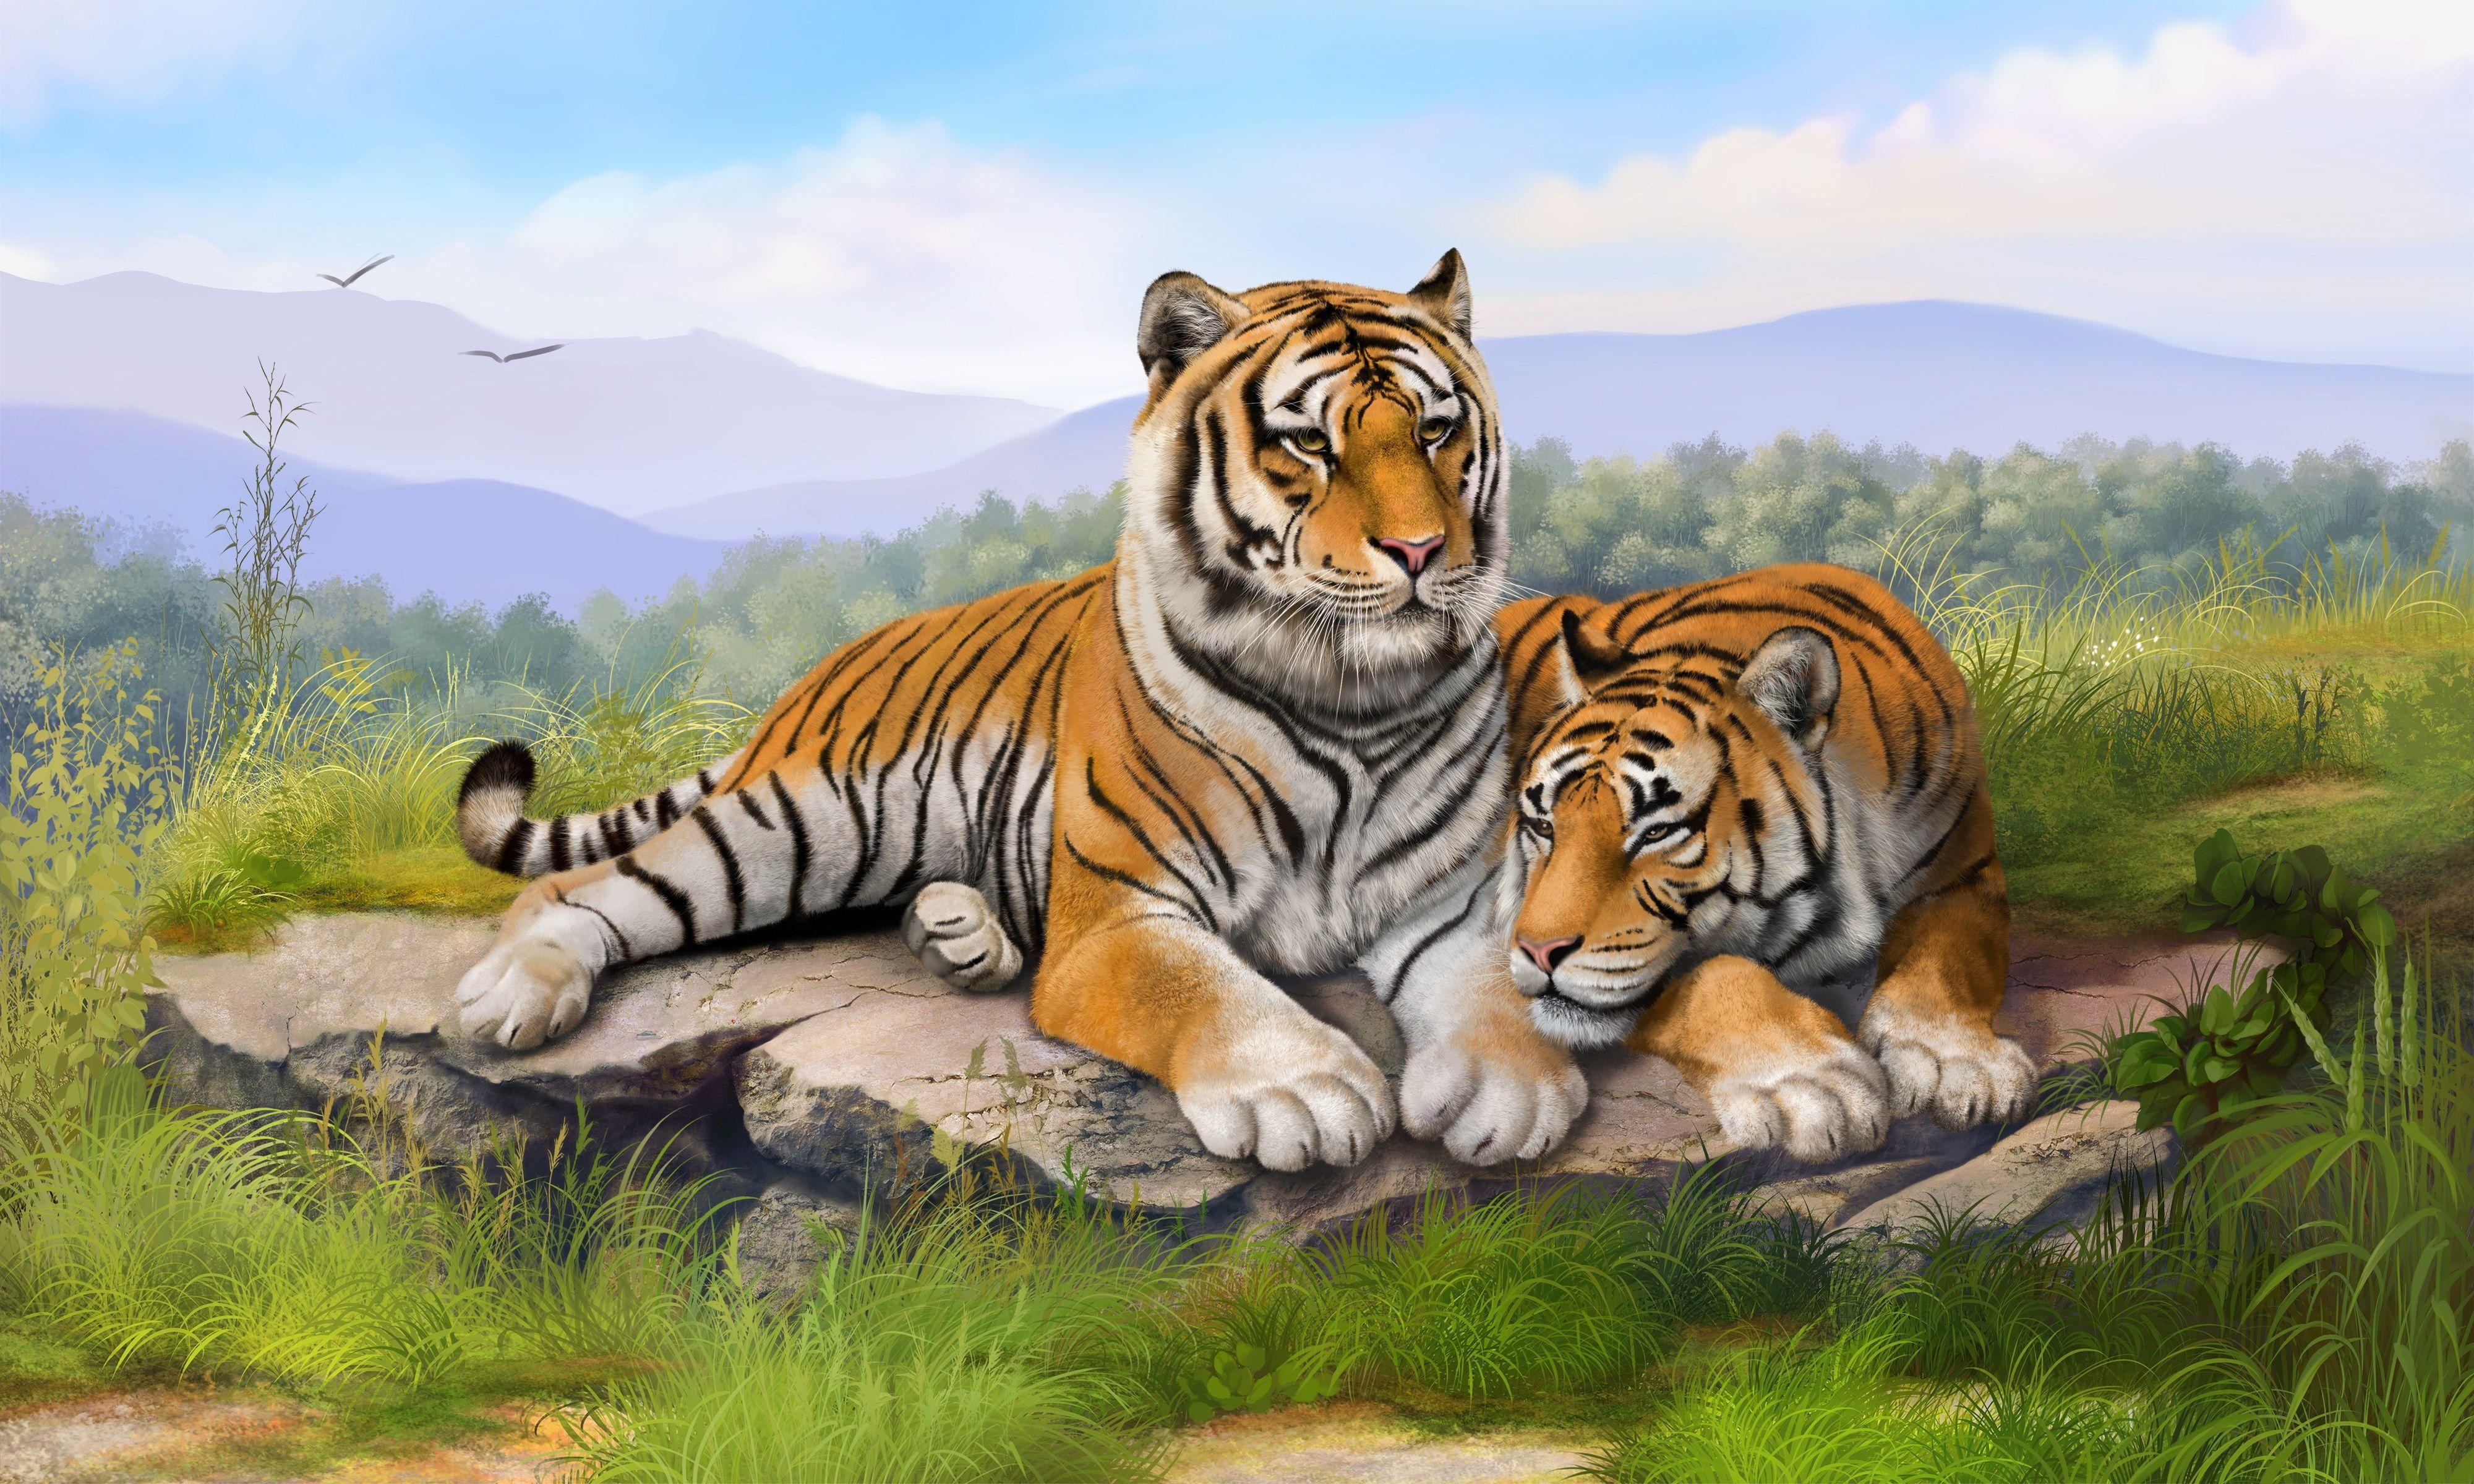 tiger wallpaper high resolution   simplexpict1st